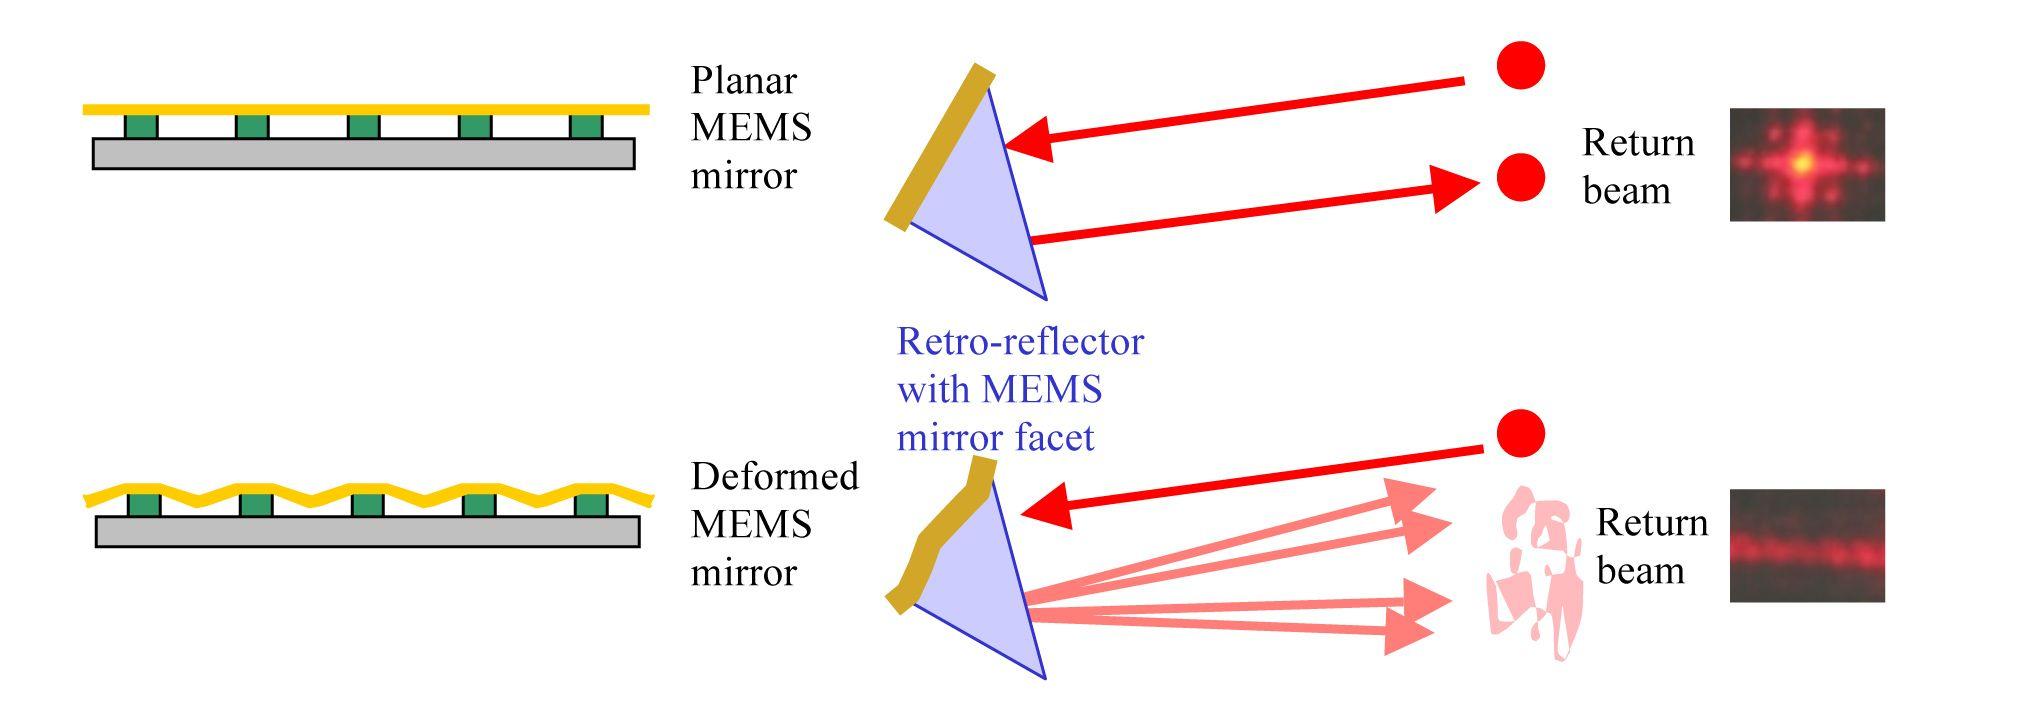 Secure Optical Communication System utilizing Deformable MEMS